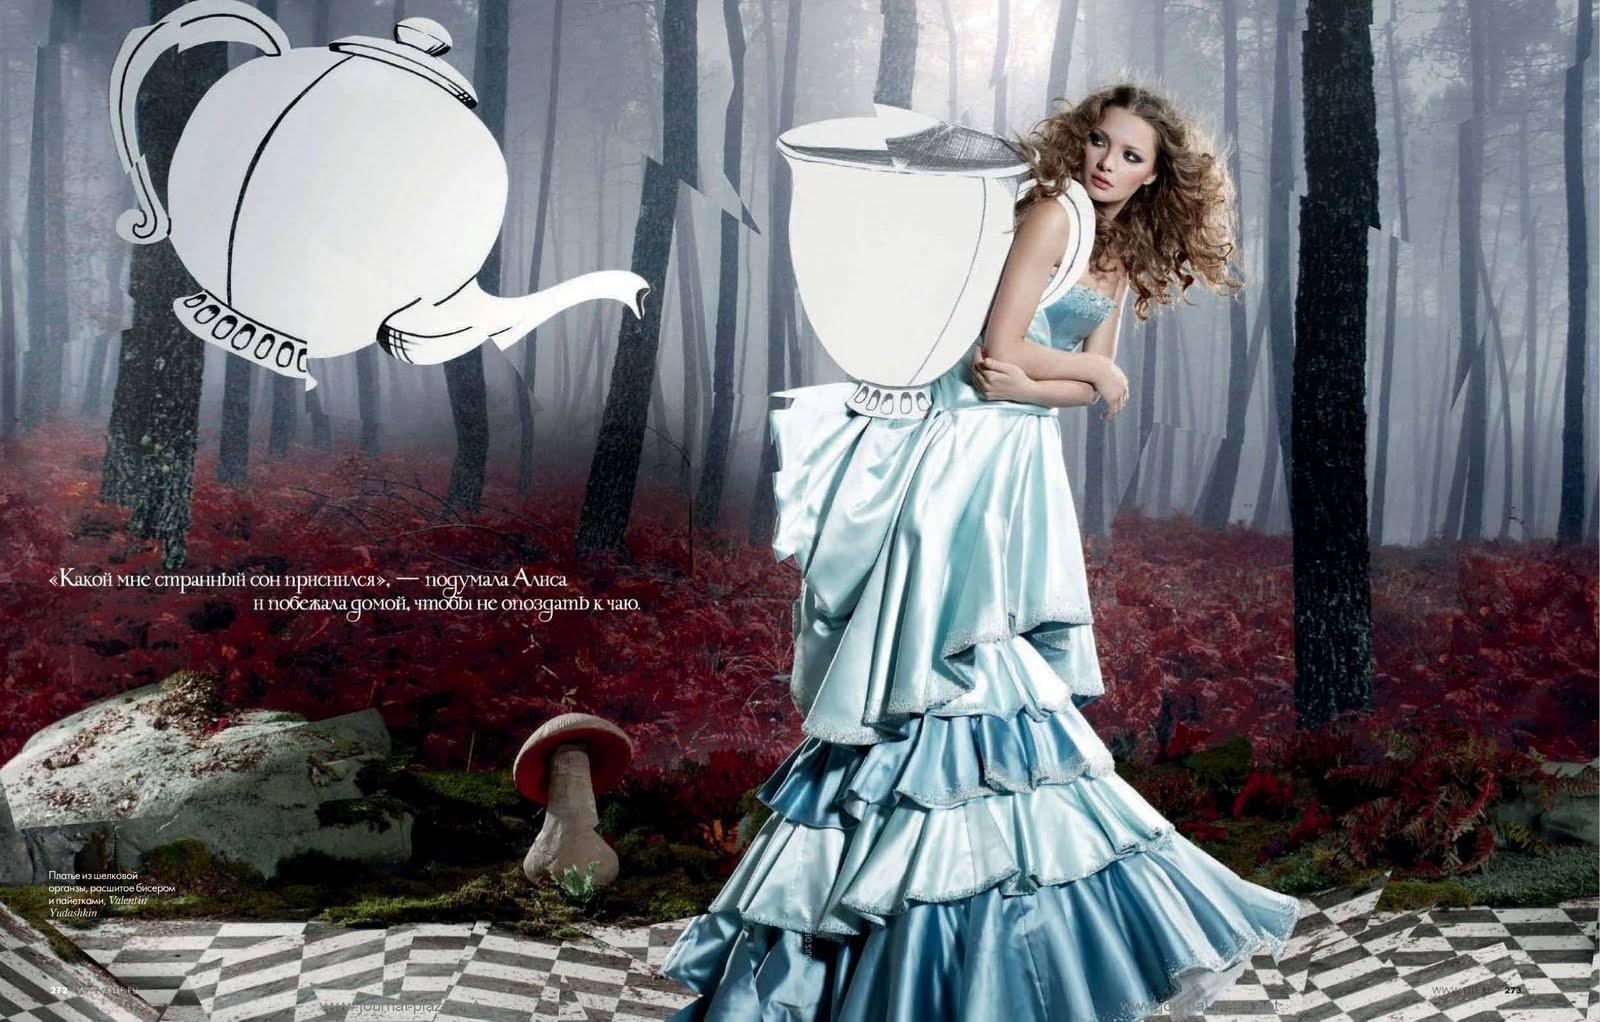 Юлия зимина фото в журнале 21 фотография